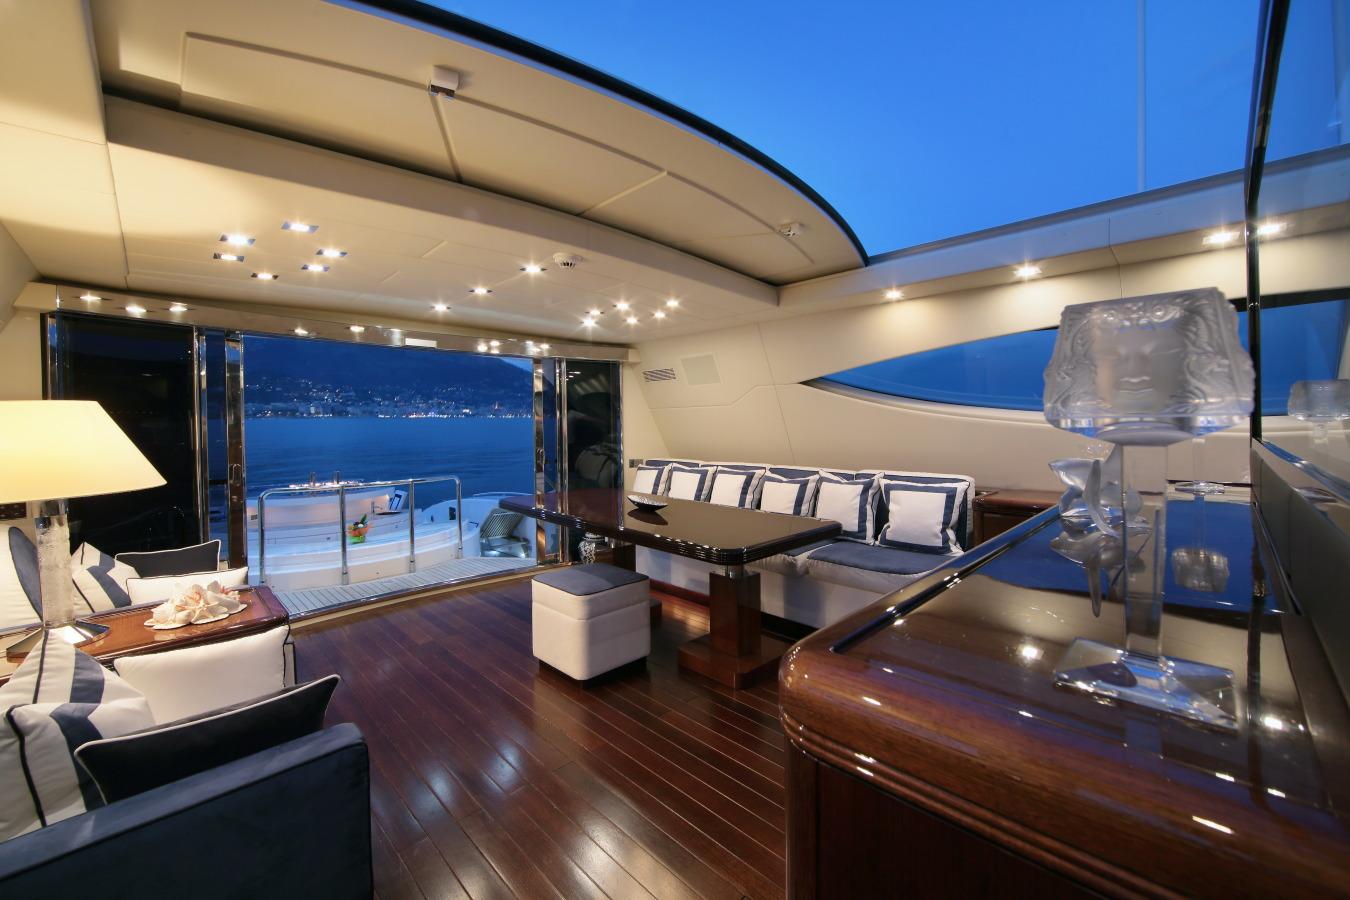 Motor yacht VERA - Deck Salon looking Aft